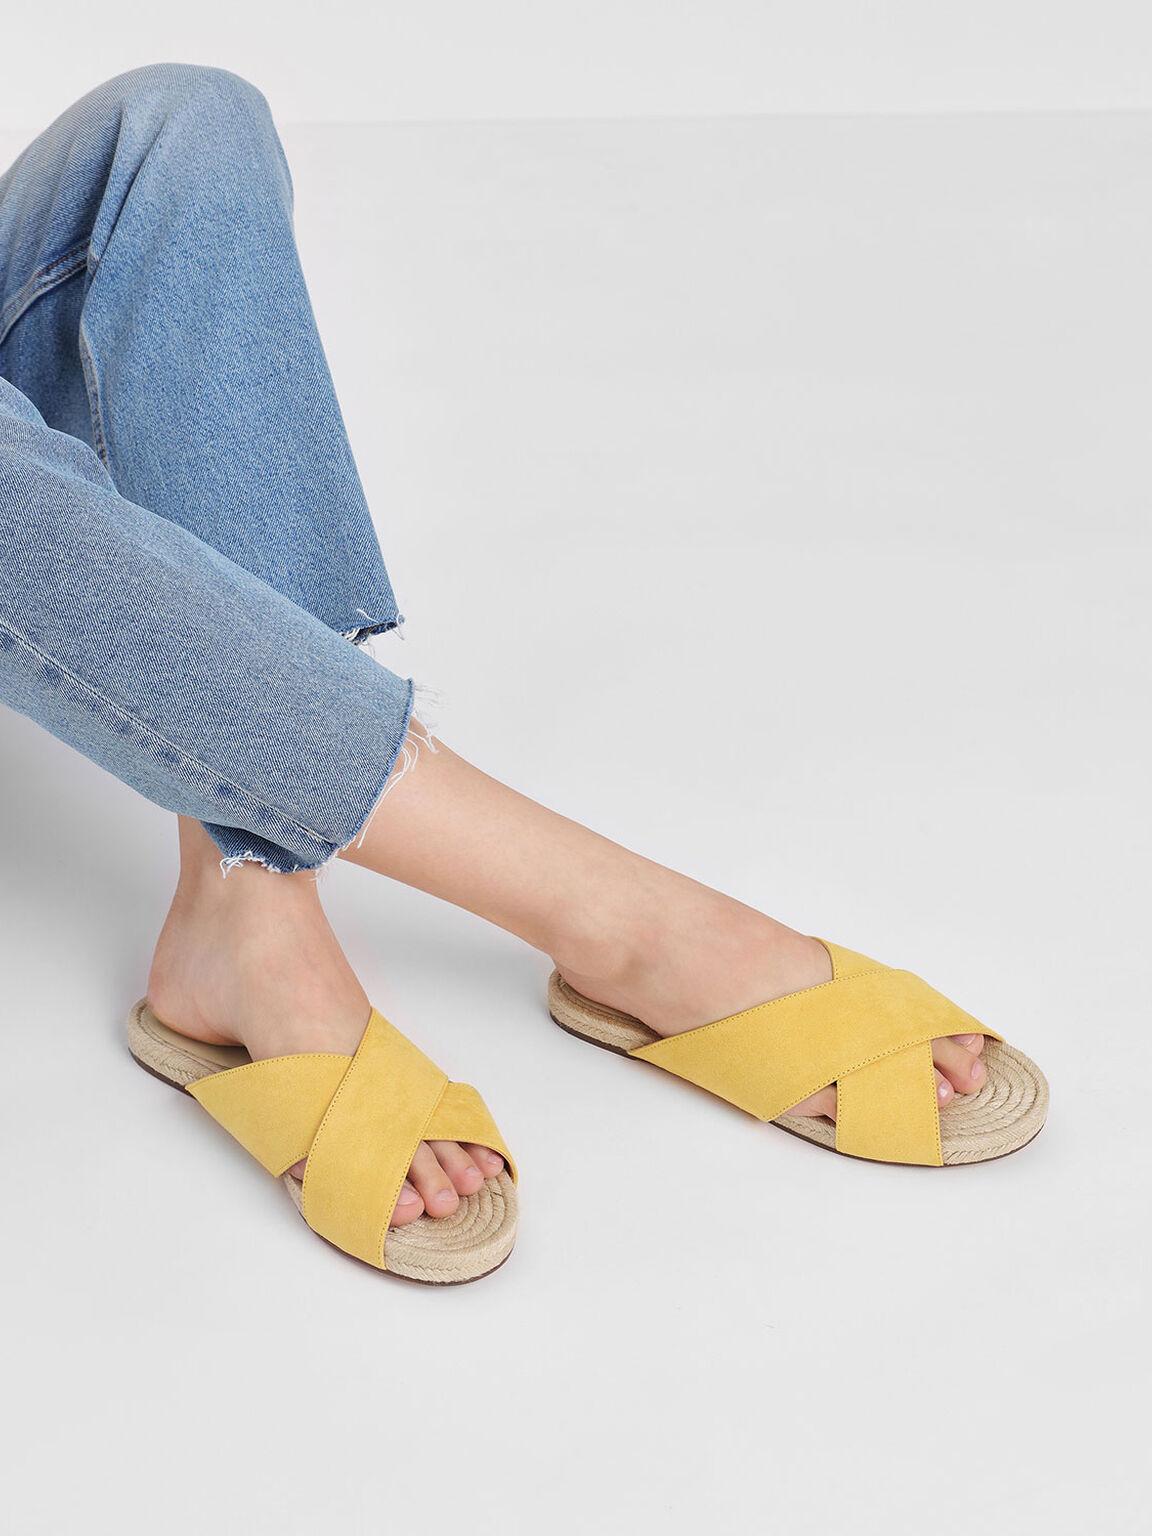 Criss Cross Slide Sandals, Yellow, hi-res